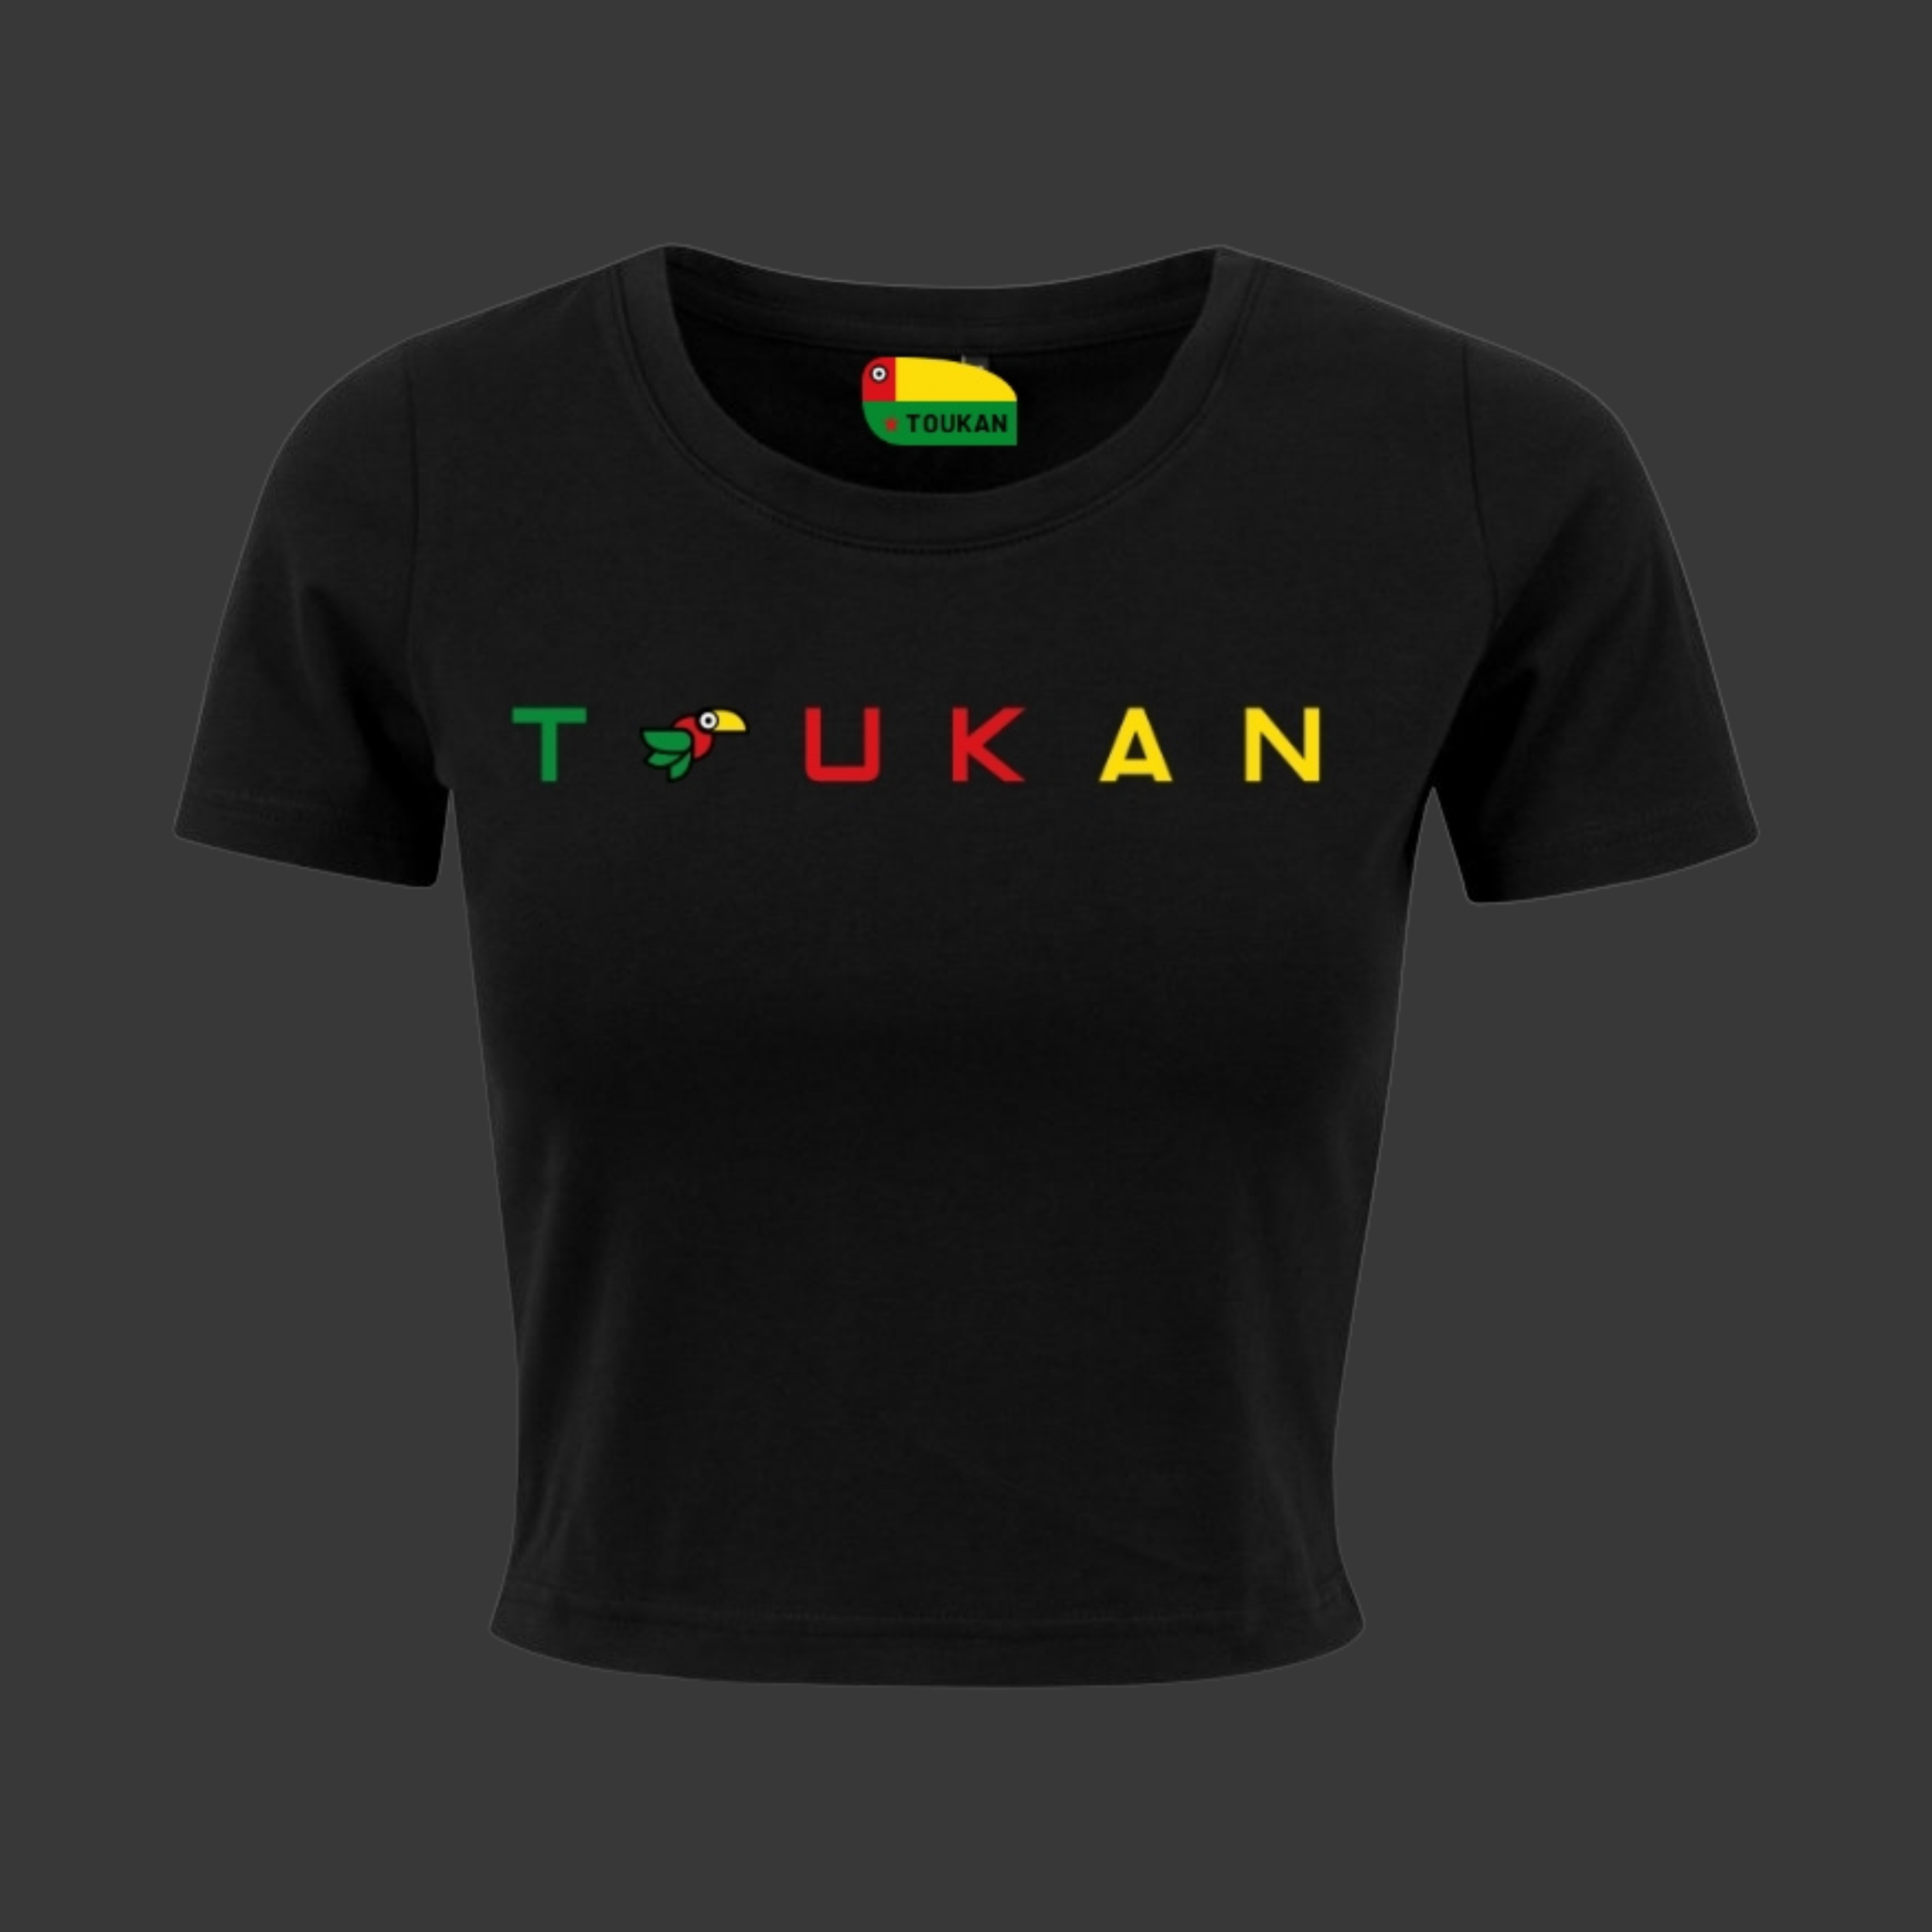 Crop top - TOUKAN - Noir - Femme